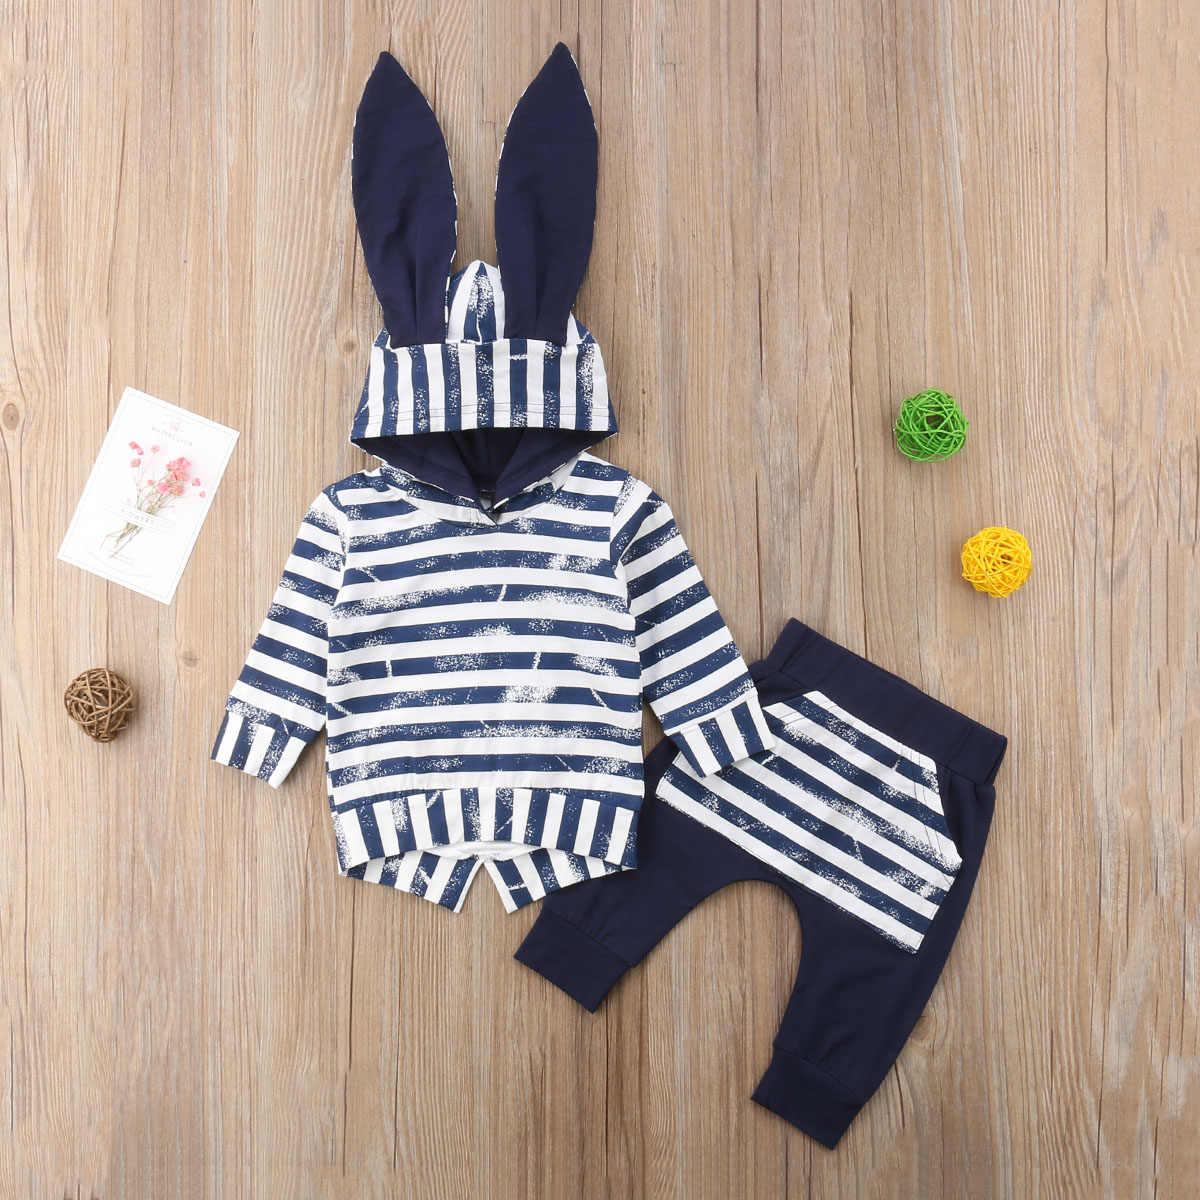 b2e39d3ed31b Detail Feedback Questions about Baby Boy Girl 3D Bunny Rabbit ...